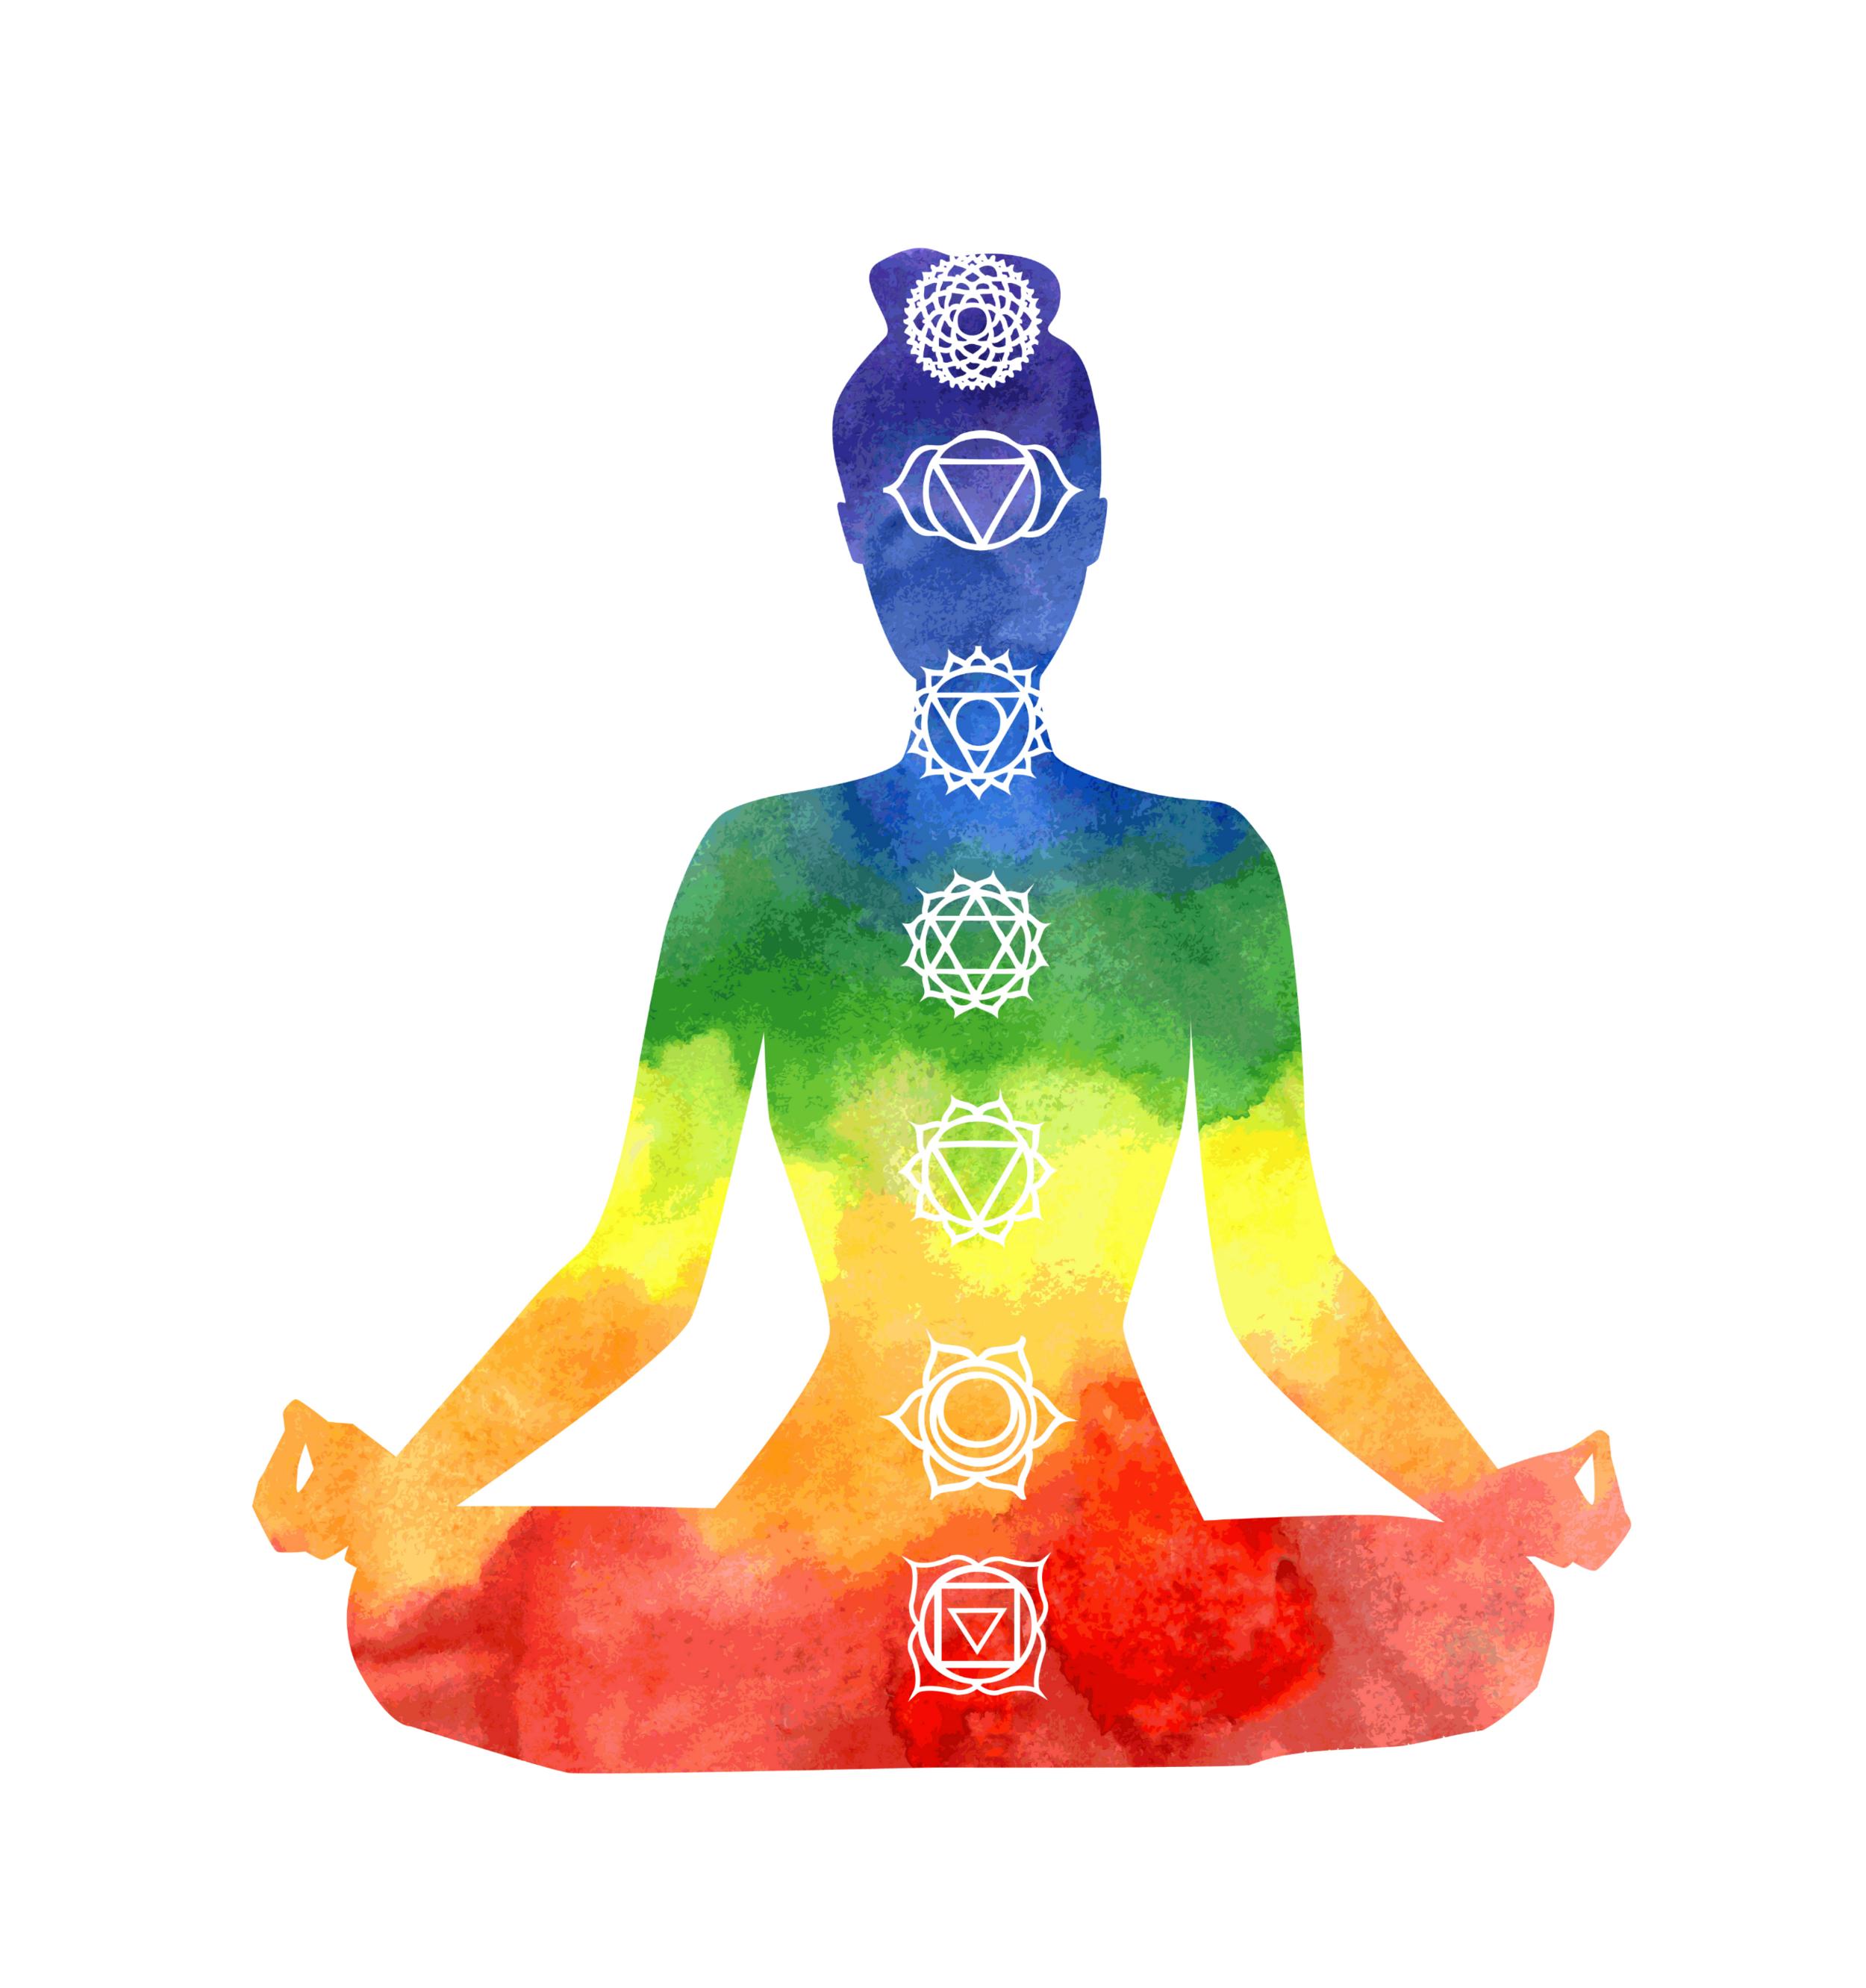 The 7 chakra energy centers.